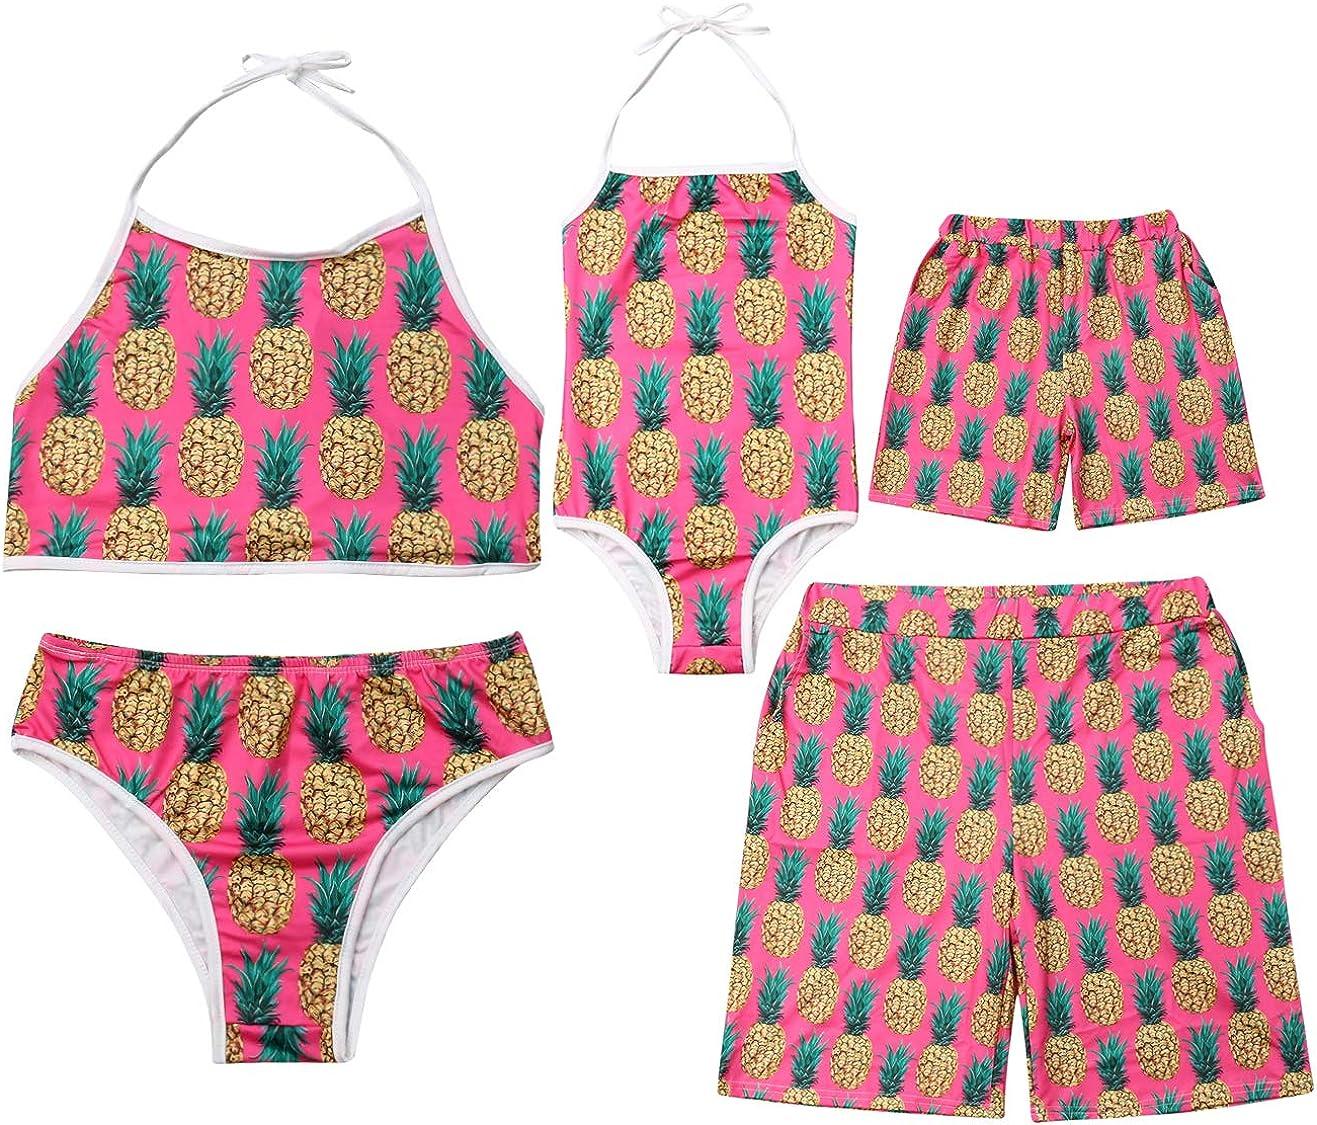 Family Matching Pineapple Print Bathing Suit Mom/&Girl Spaghetti Straps Halter Neck Swimsuit Dad/&Boy Swim Trunks